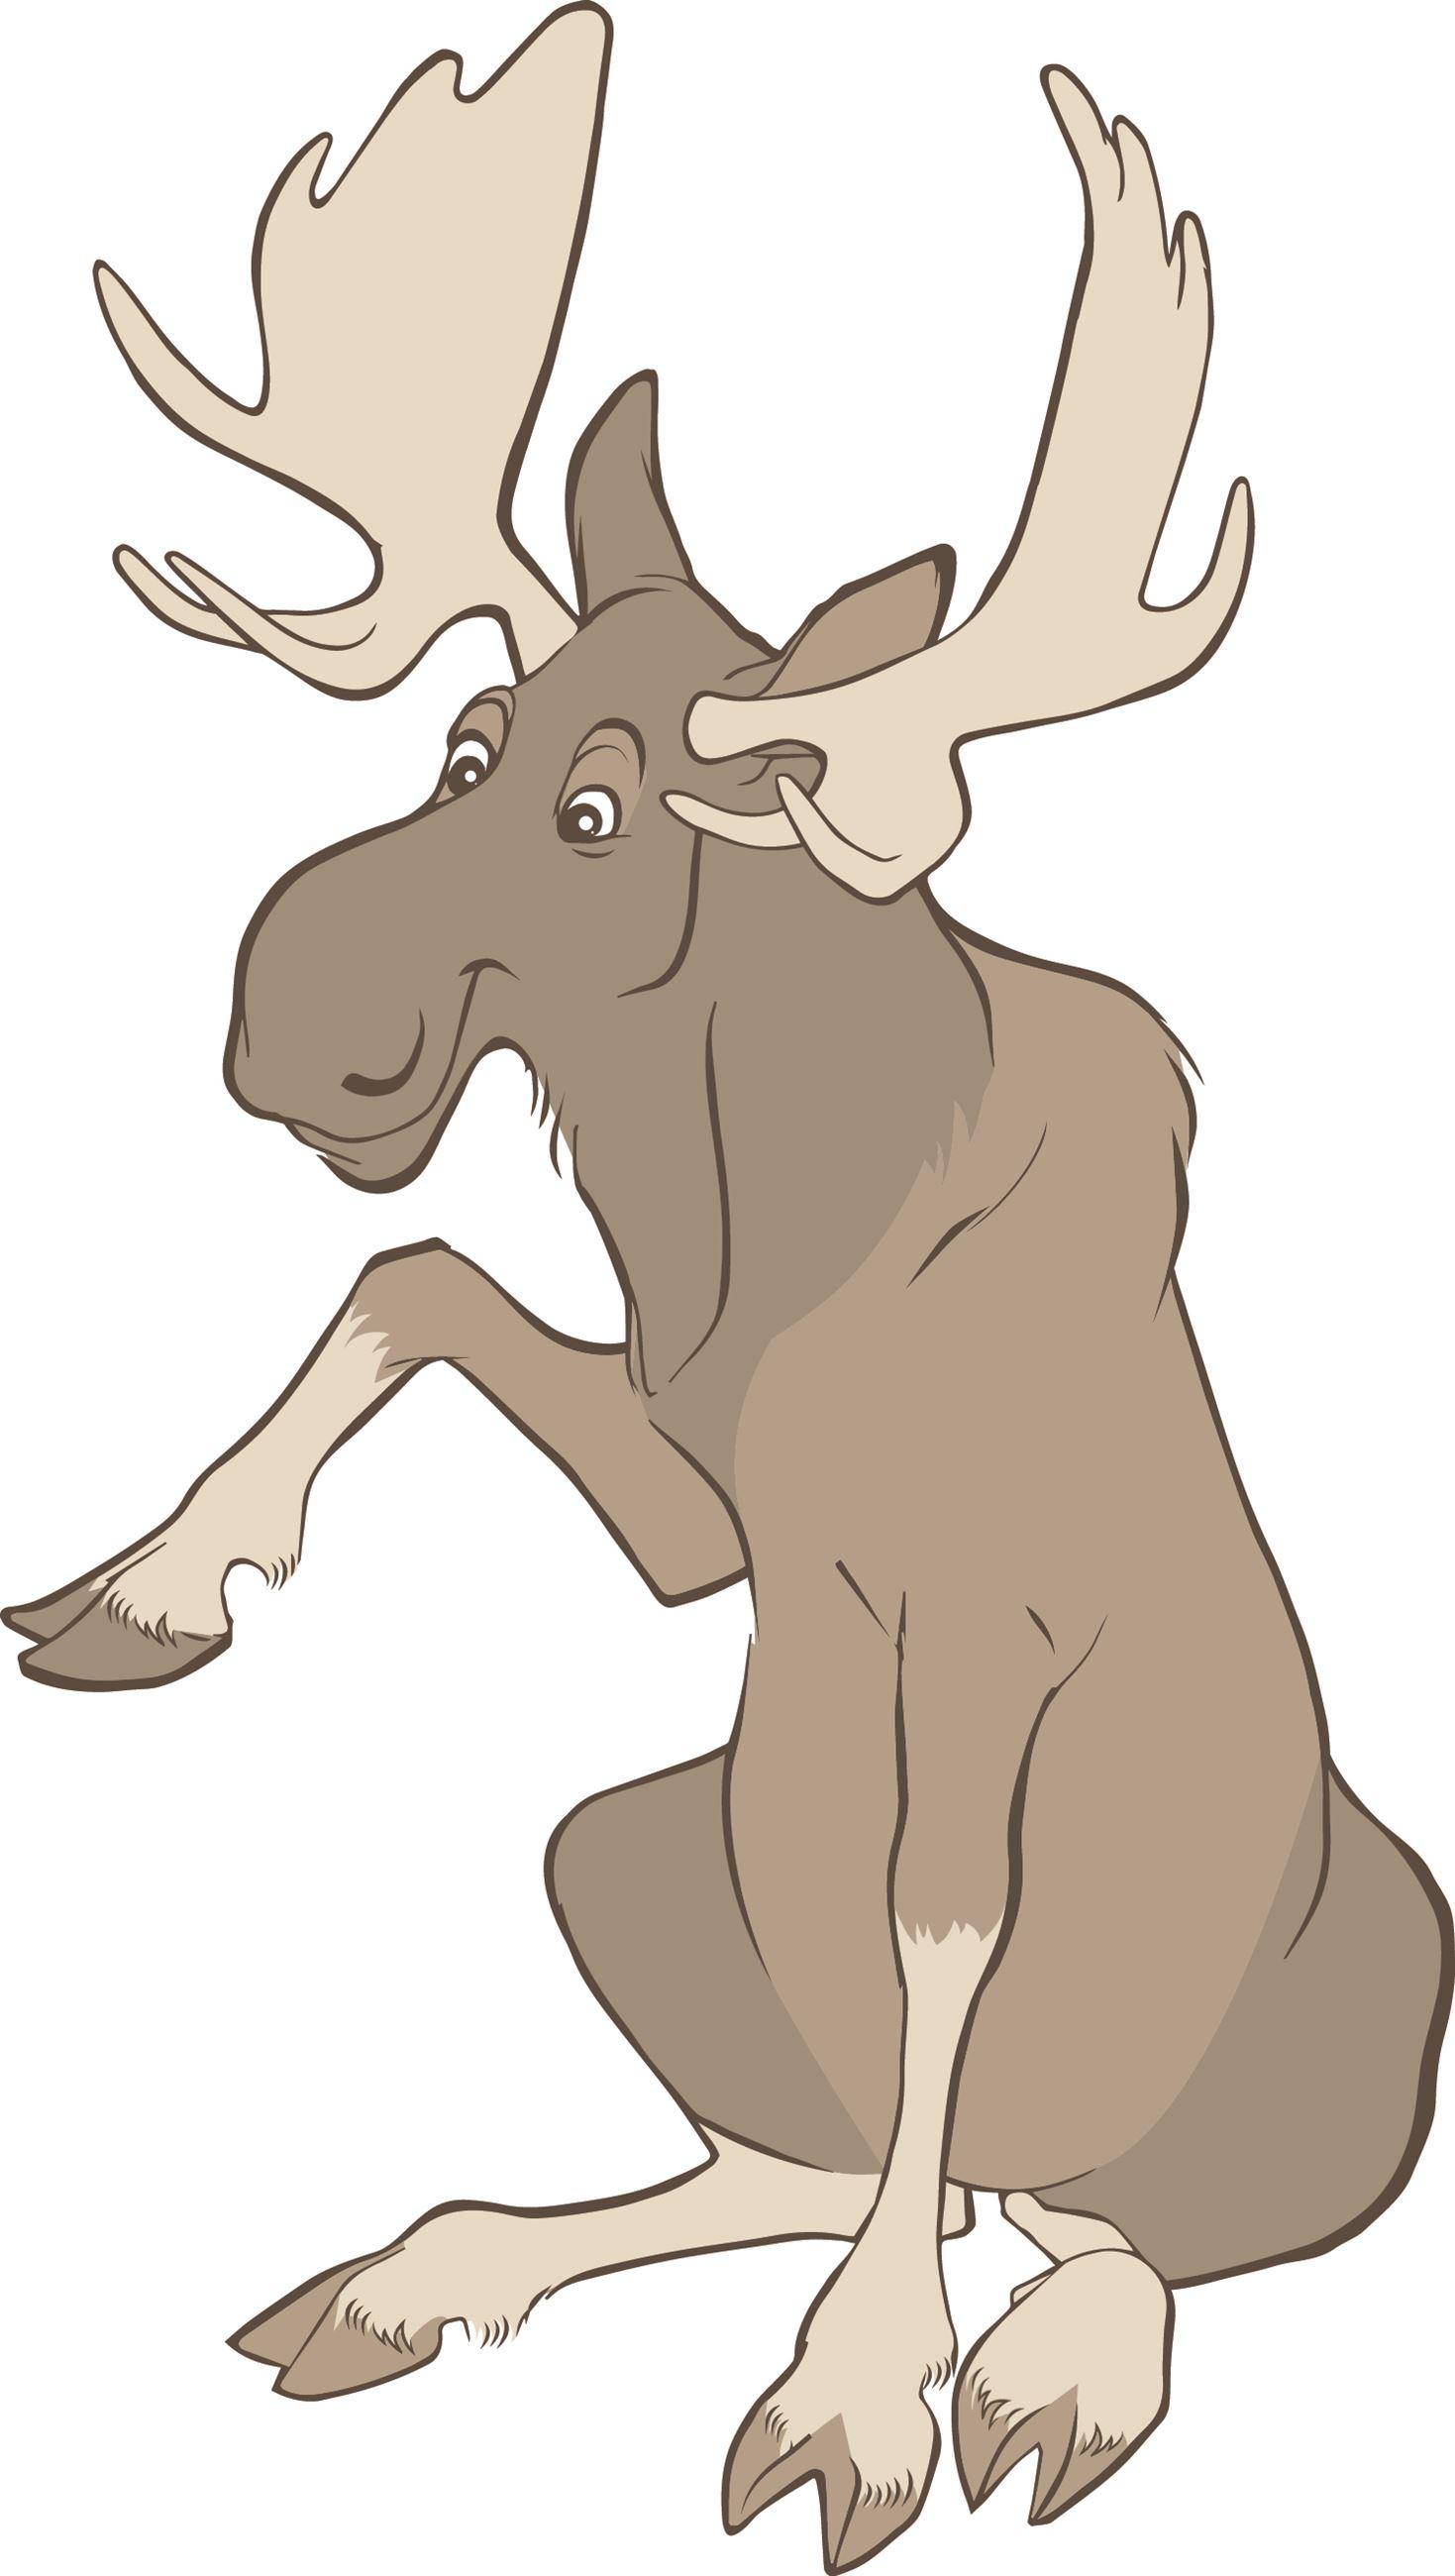 Mac the Moose | Missoula, MT - Official Website